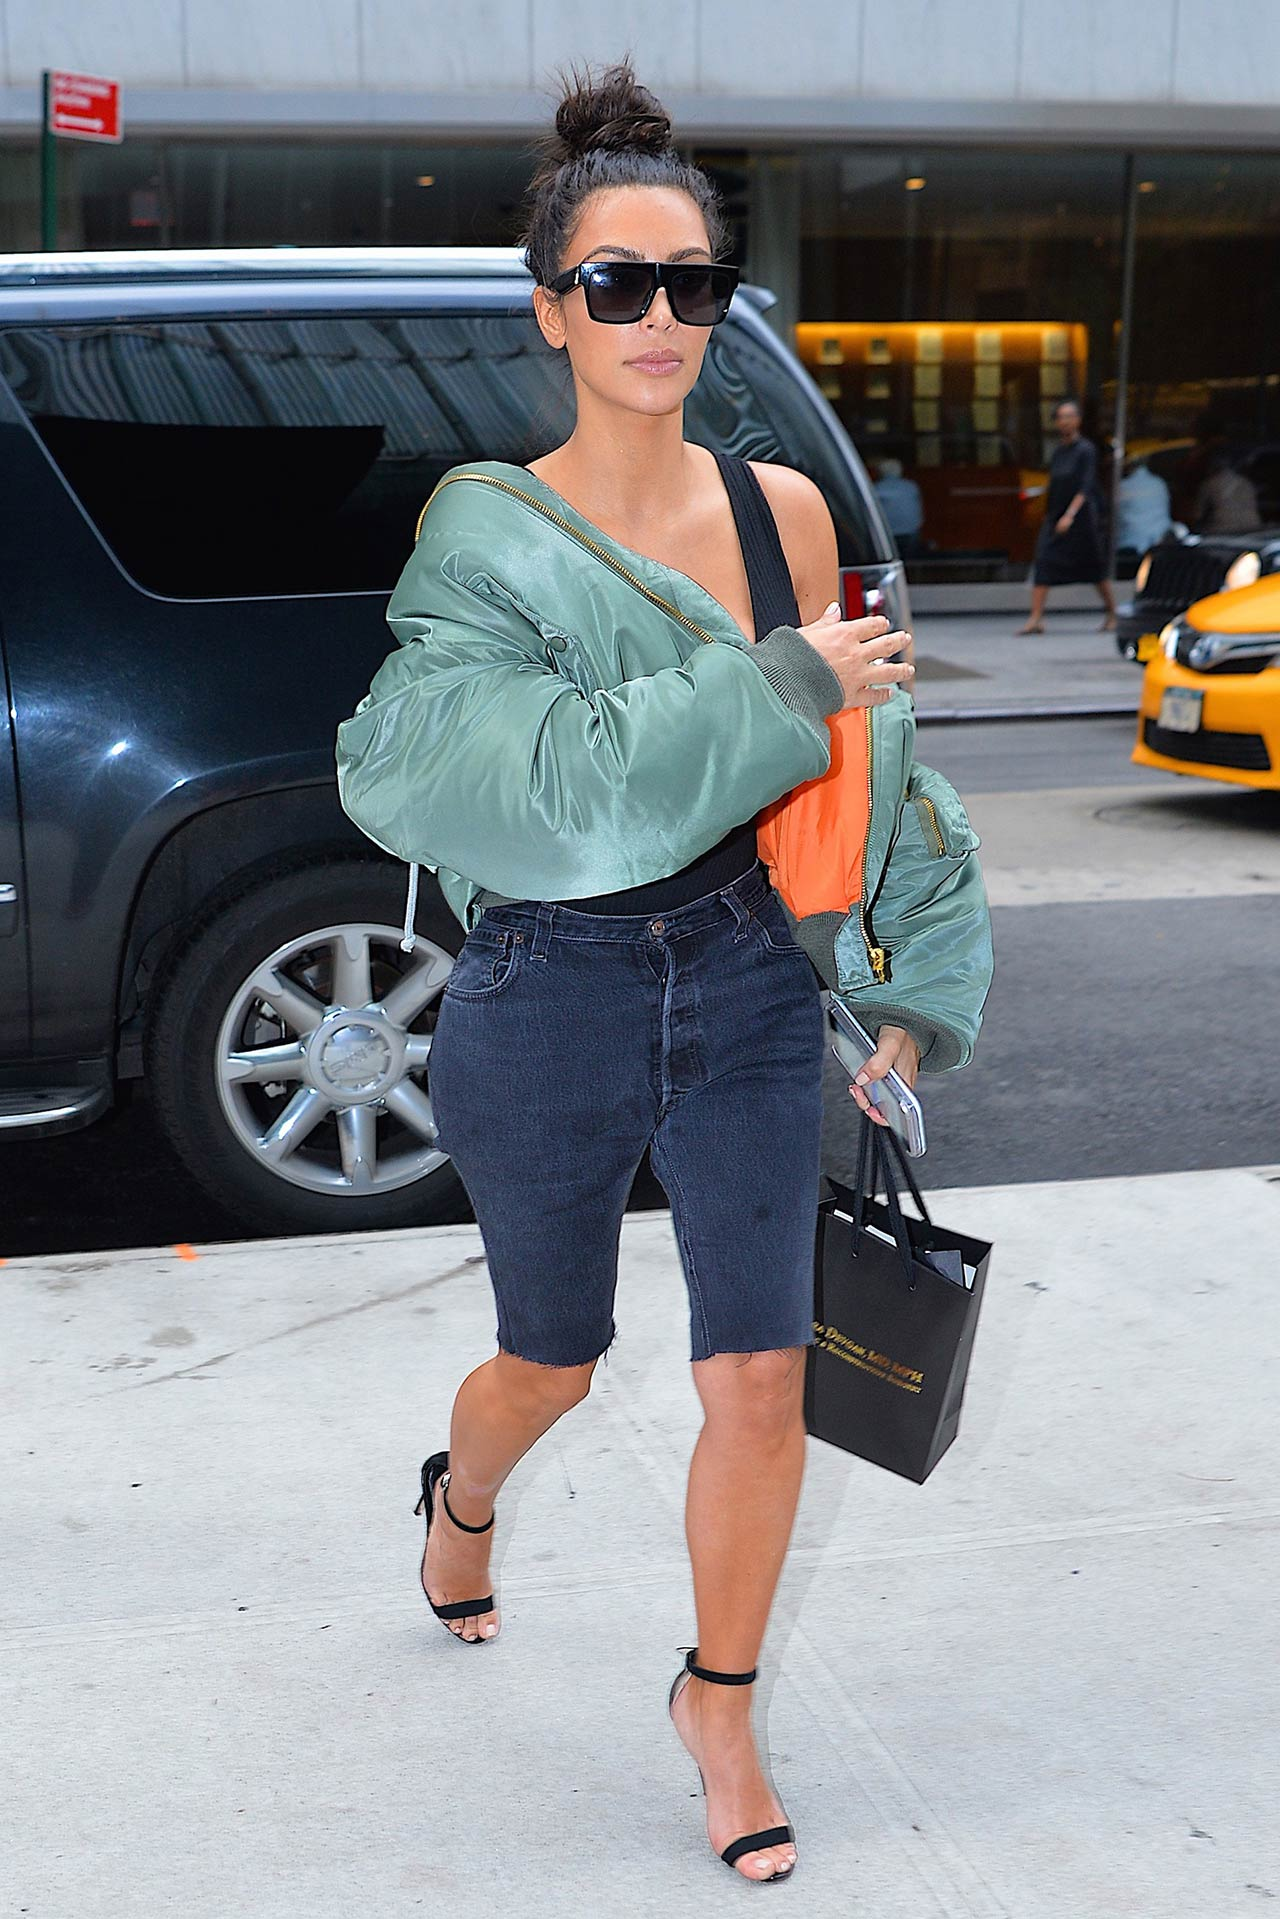 841d69e149 Kim Kardashian Wears Custom Levi s Denim Shorts